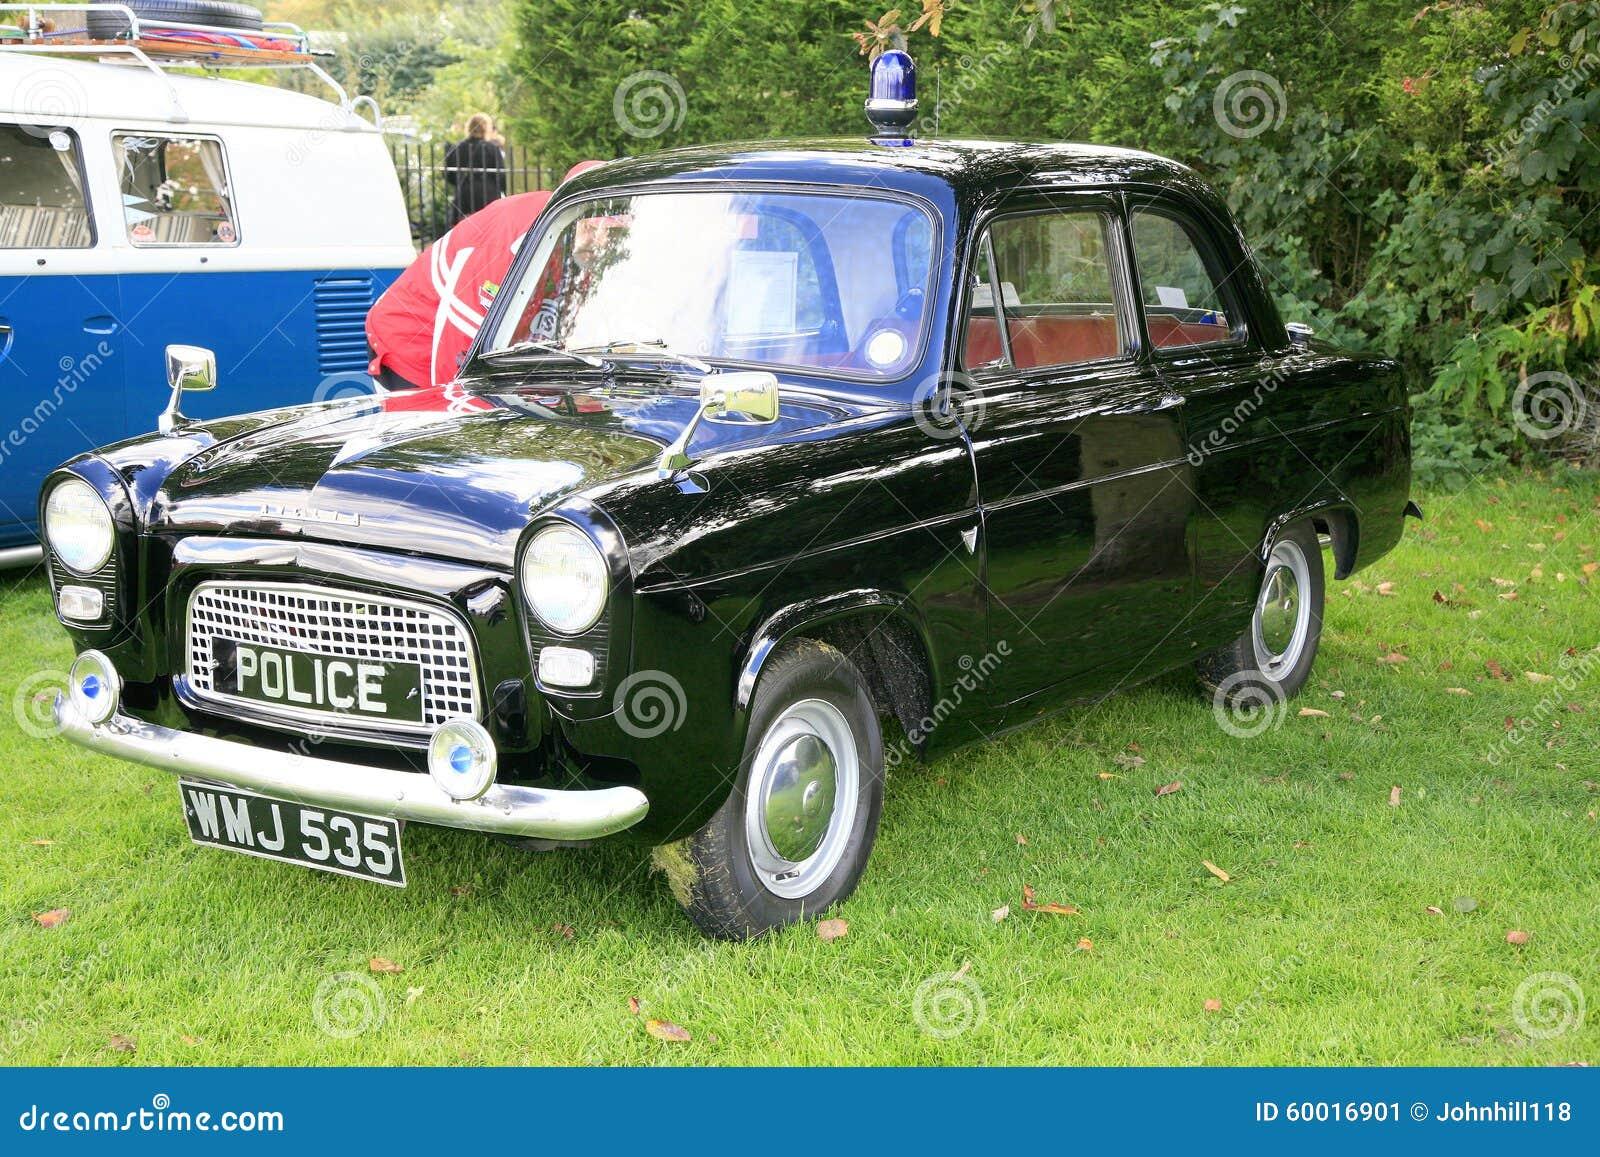 Used Police Car Custom